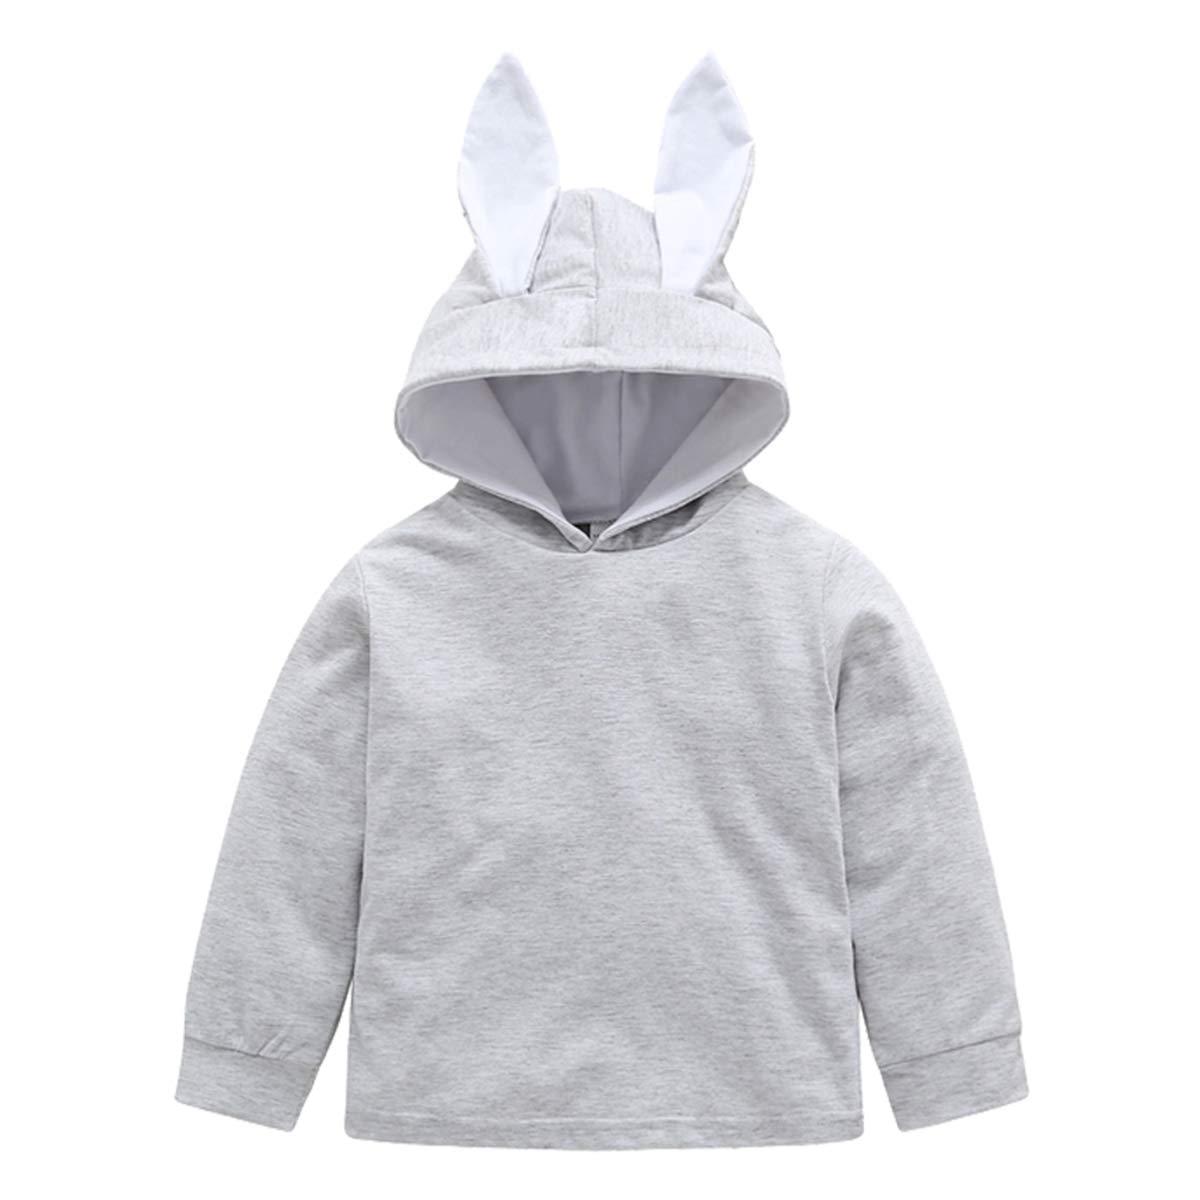 Baby Girl Clothes Hoodie Sweatshirt Solid Long Sleeve Rabbit Ear Outwear